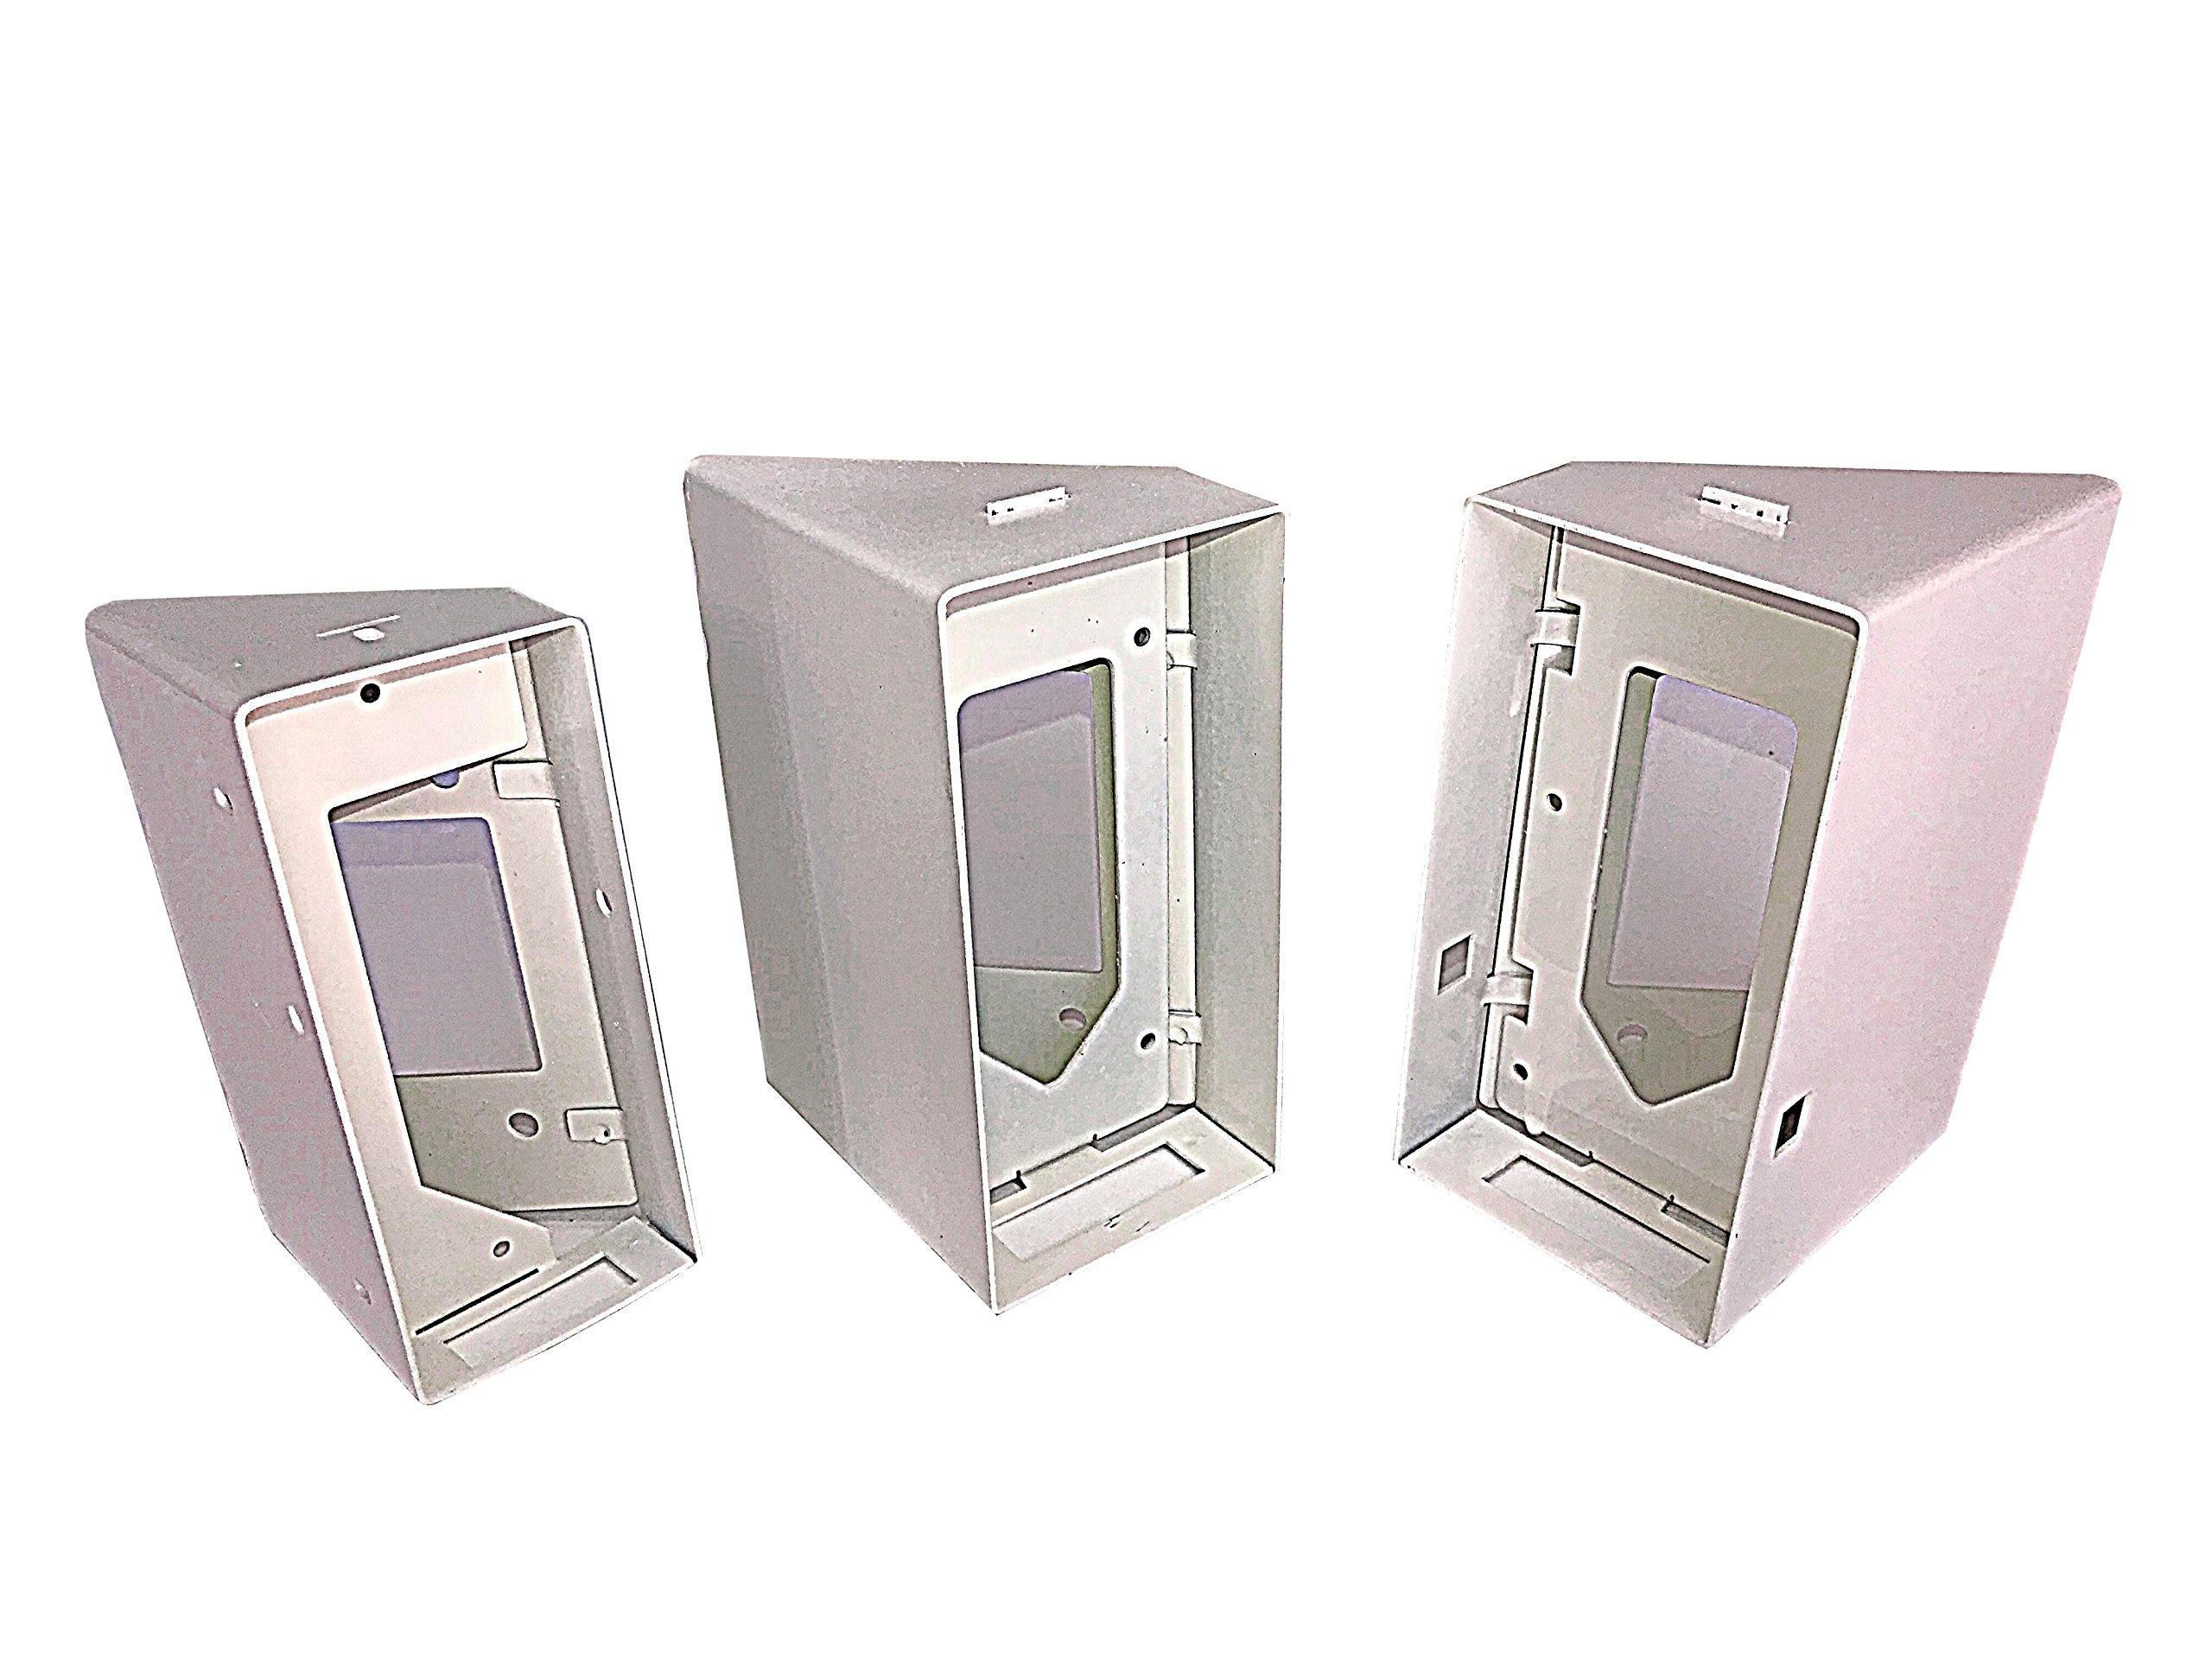 SunStateSpecialties 45 Degree Angle Ring Doorbell Mounting Box (Ring Doorbell PRO, Right Side Mount)